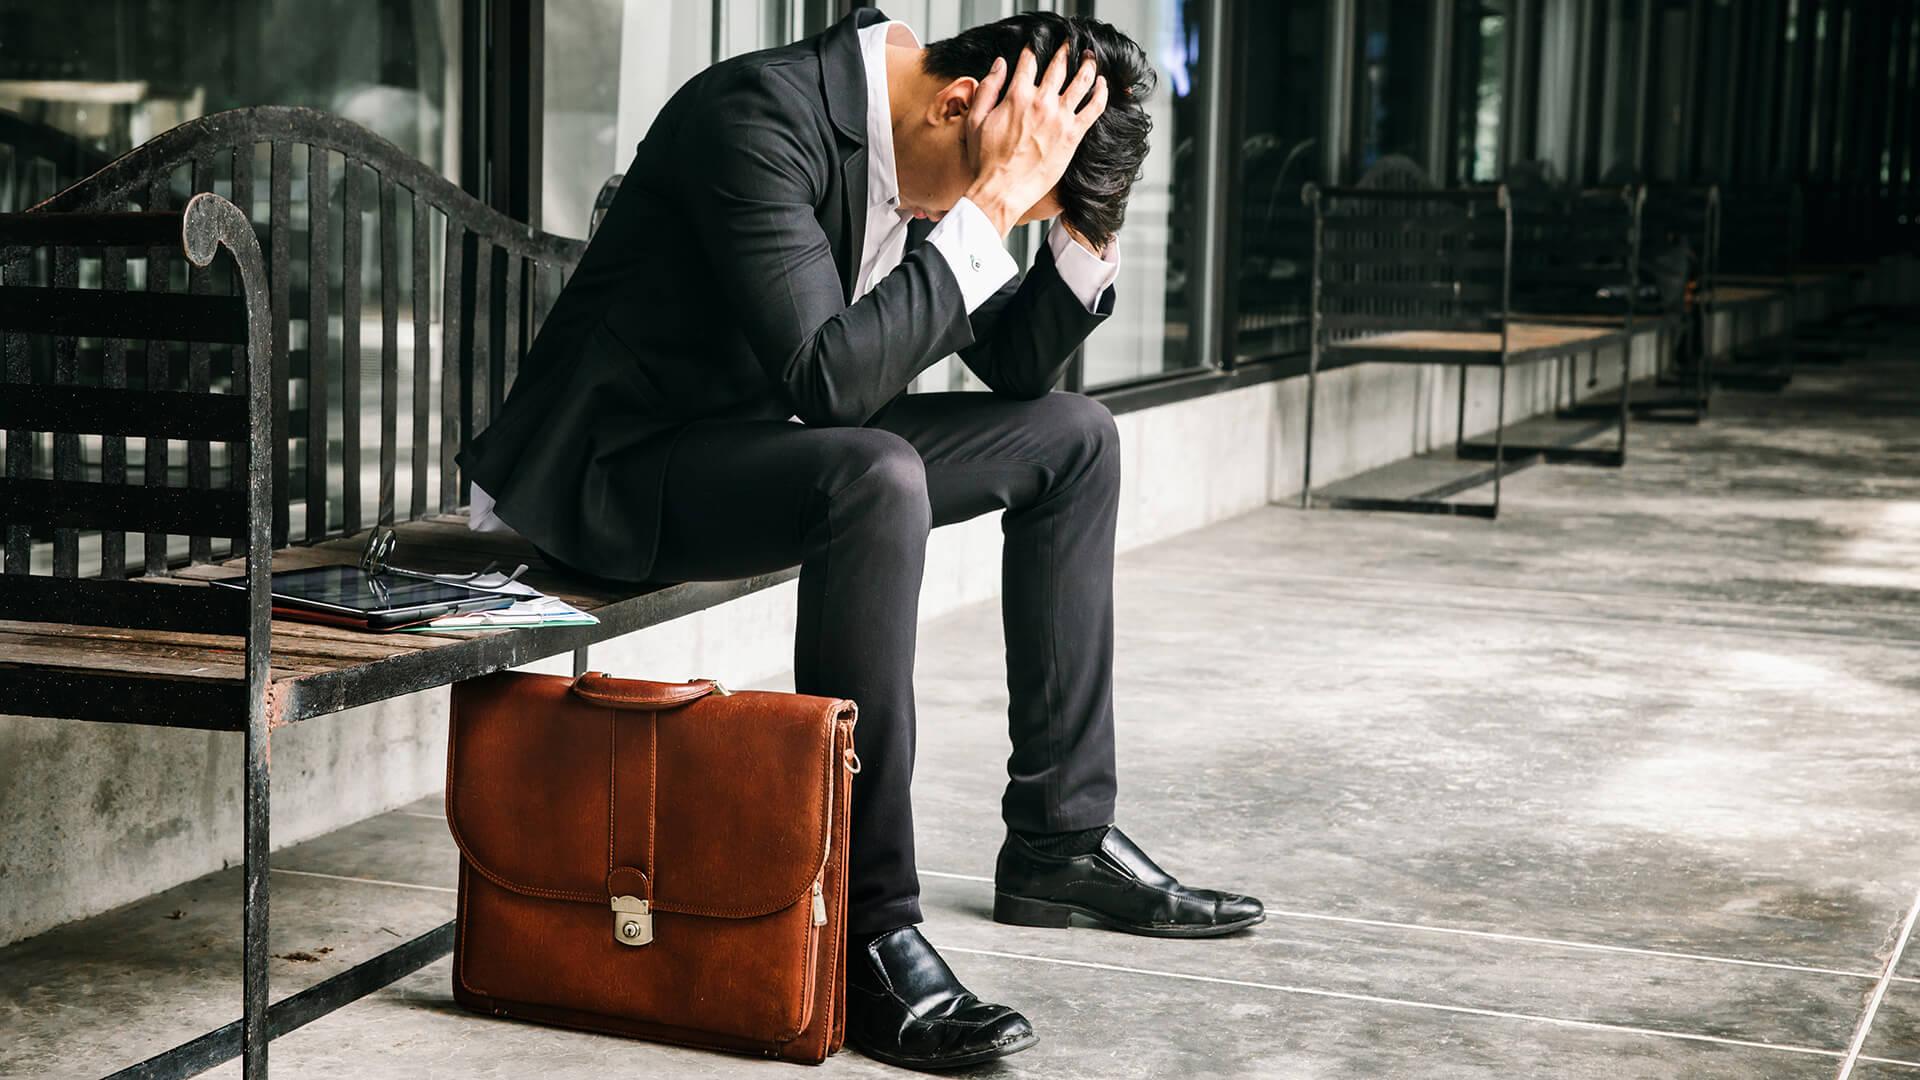 Concept of business failure and unemployment problem.